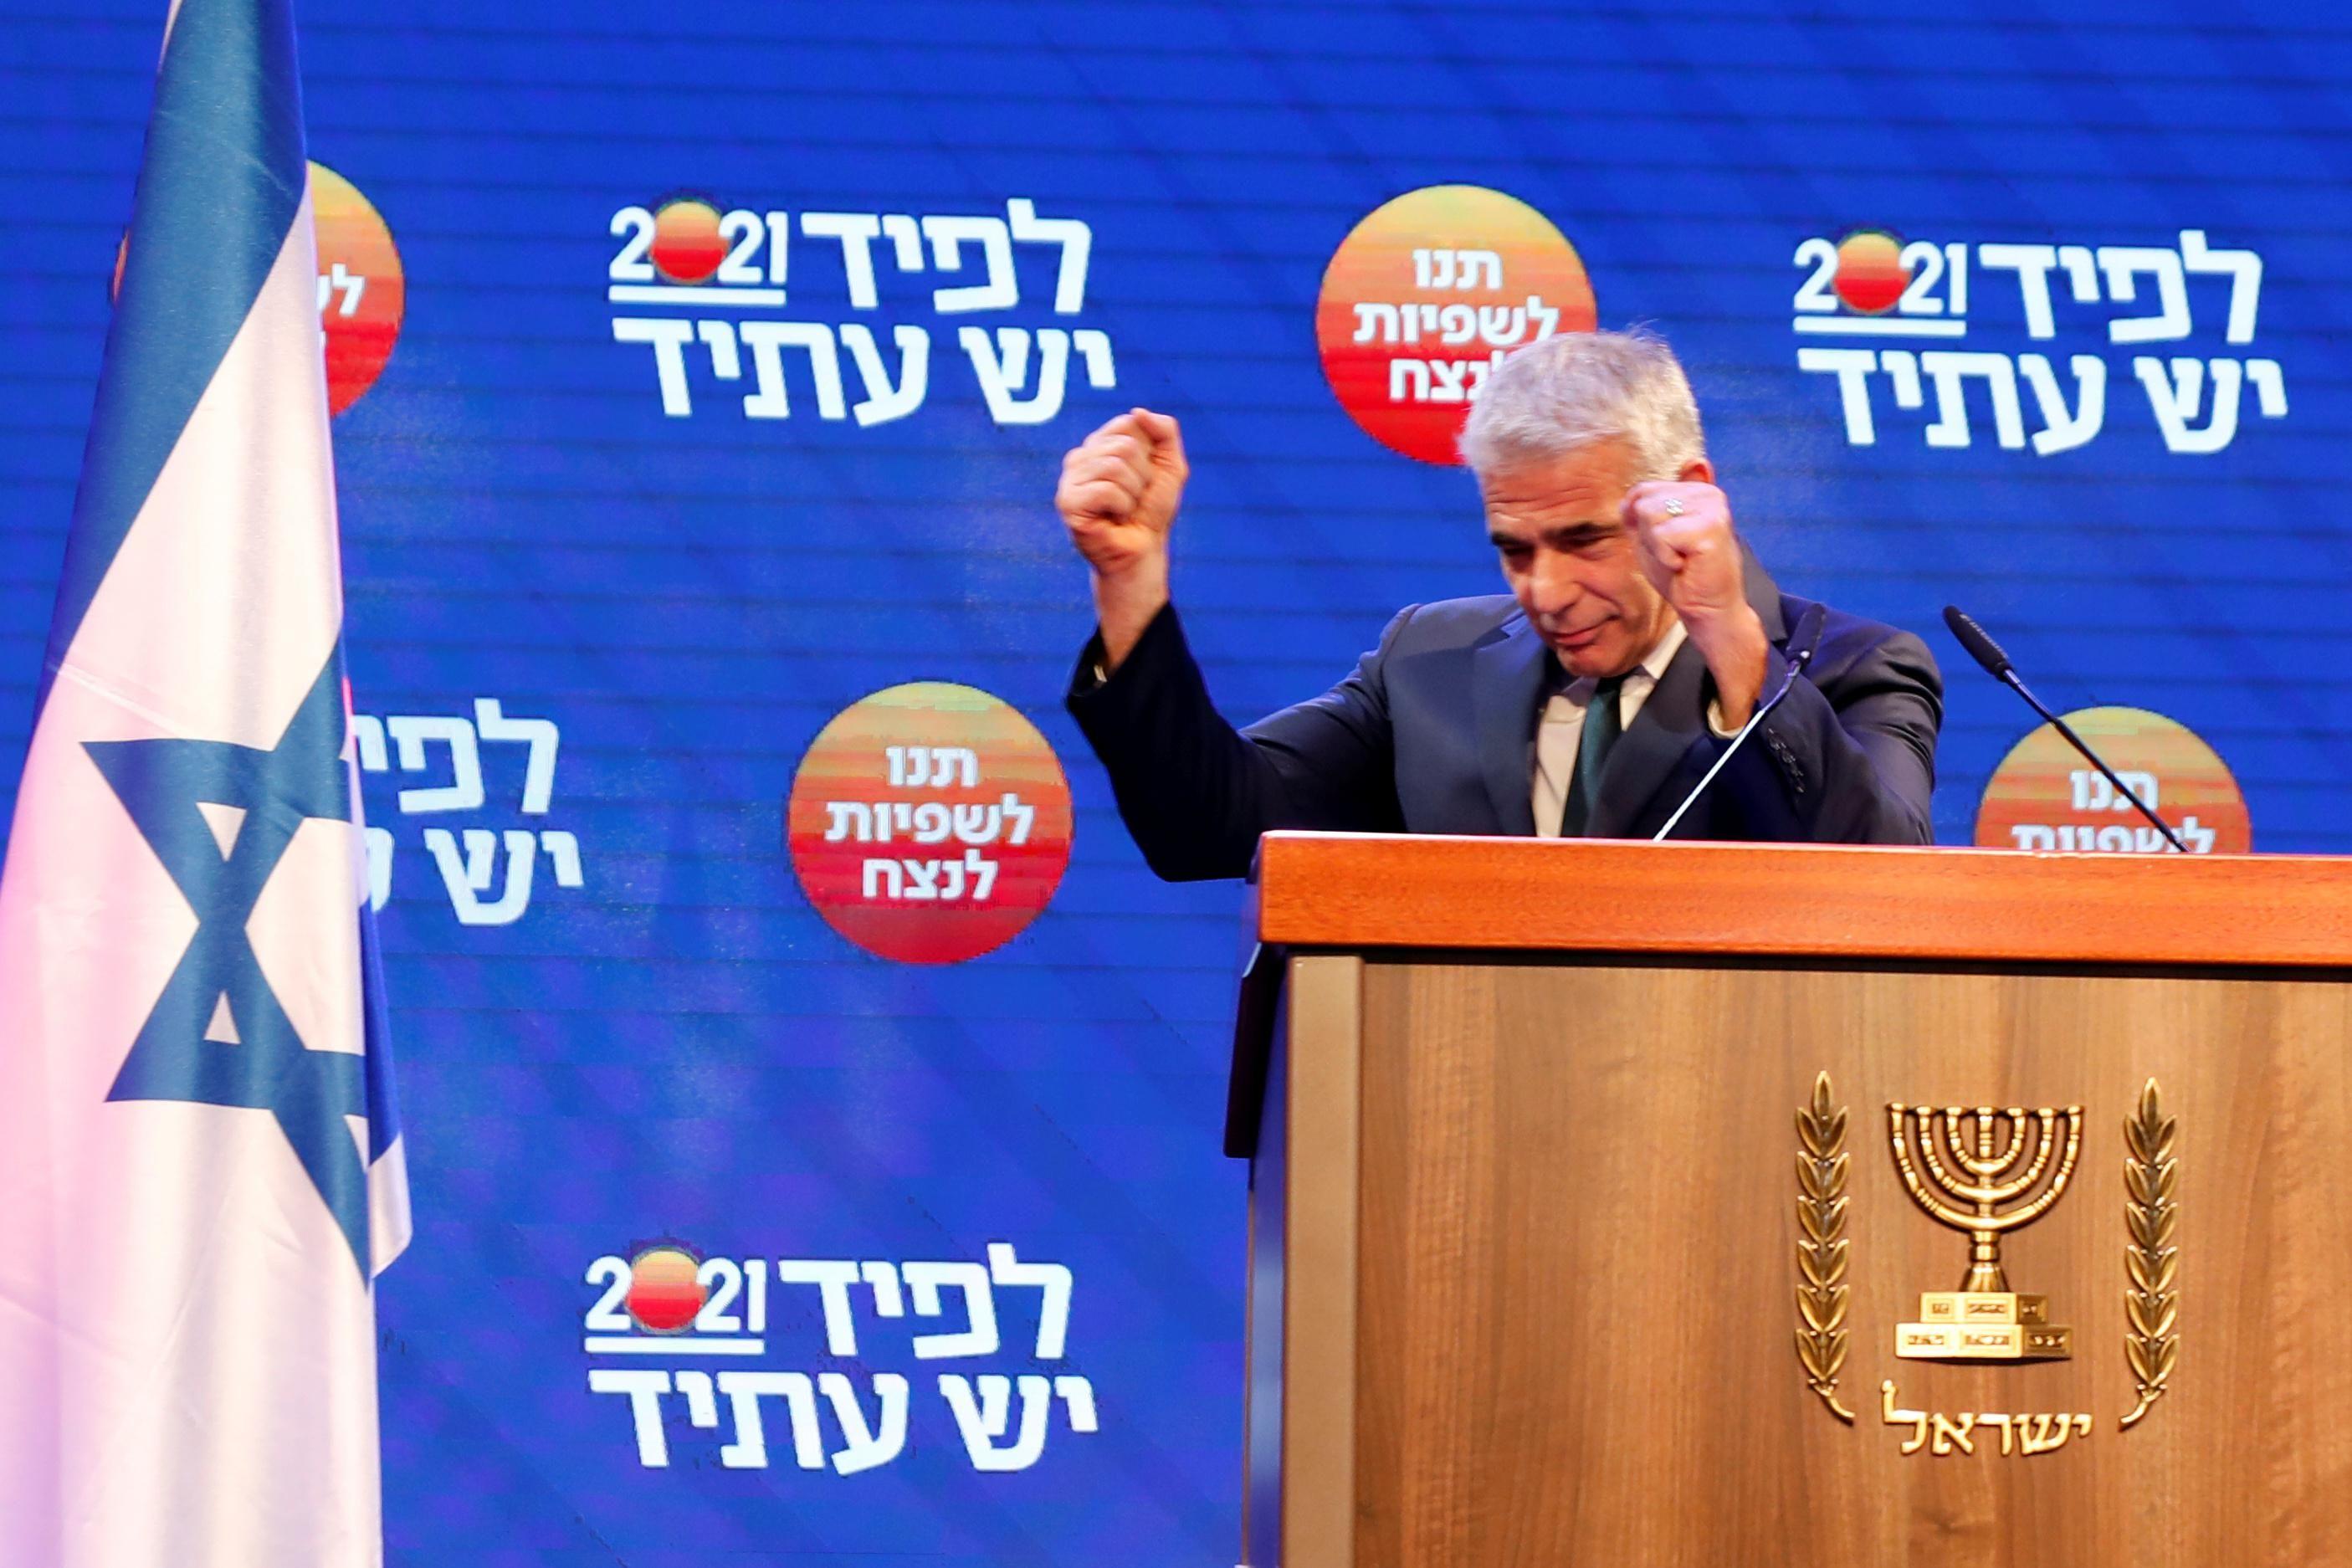 Hard Numbers: Israel PM hopeful, Facebook board punts on Trump, Japan's COVID squid, US population declining